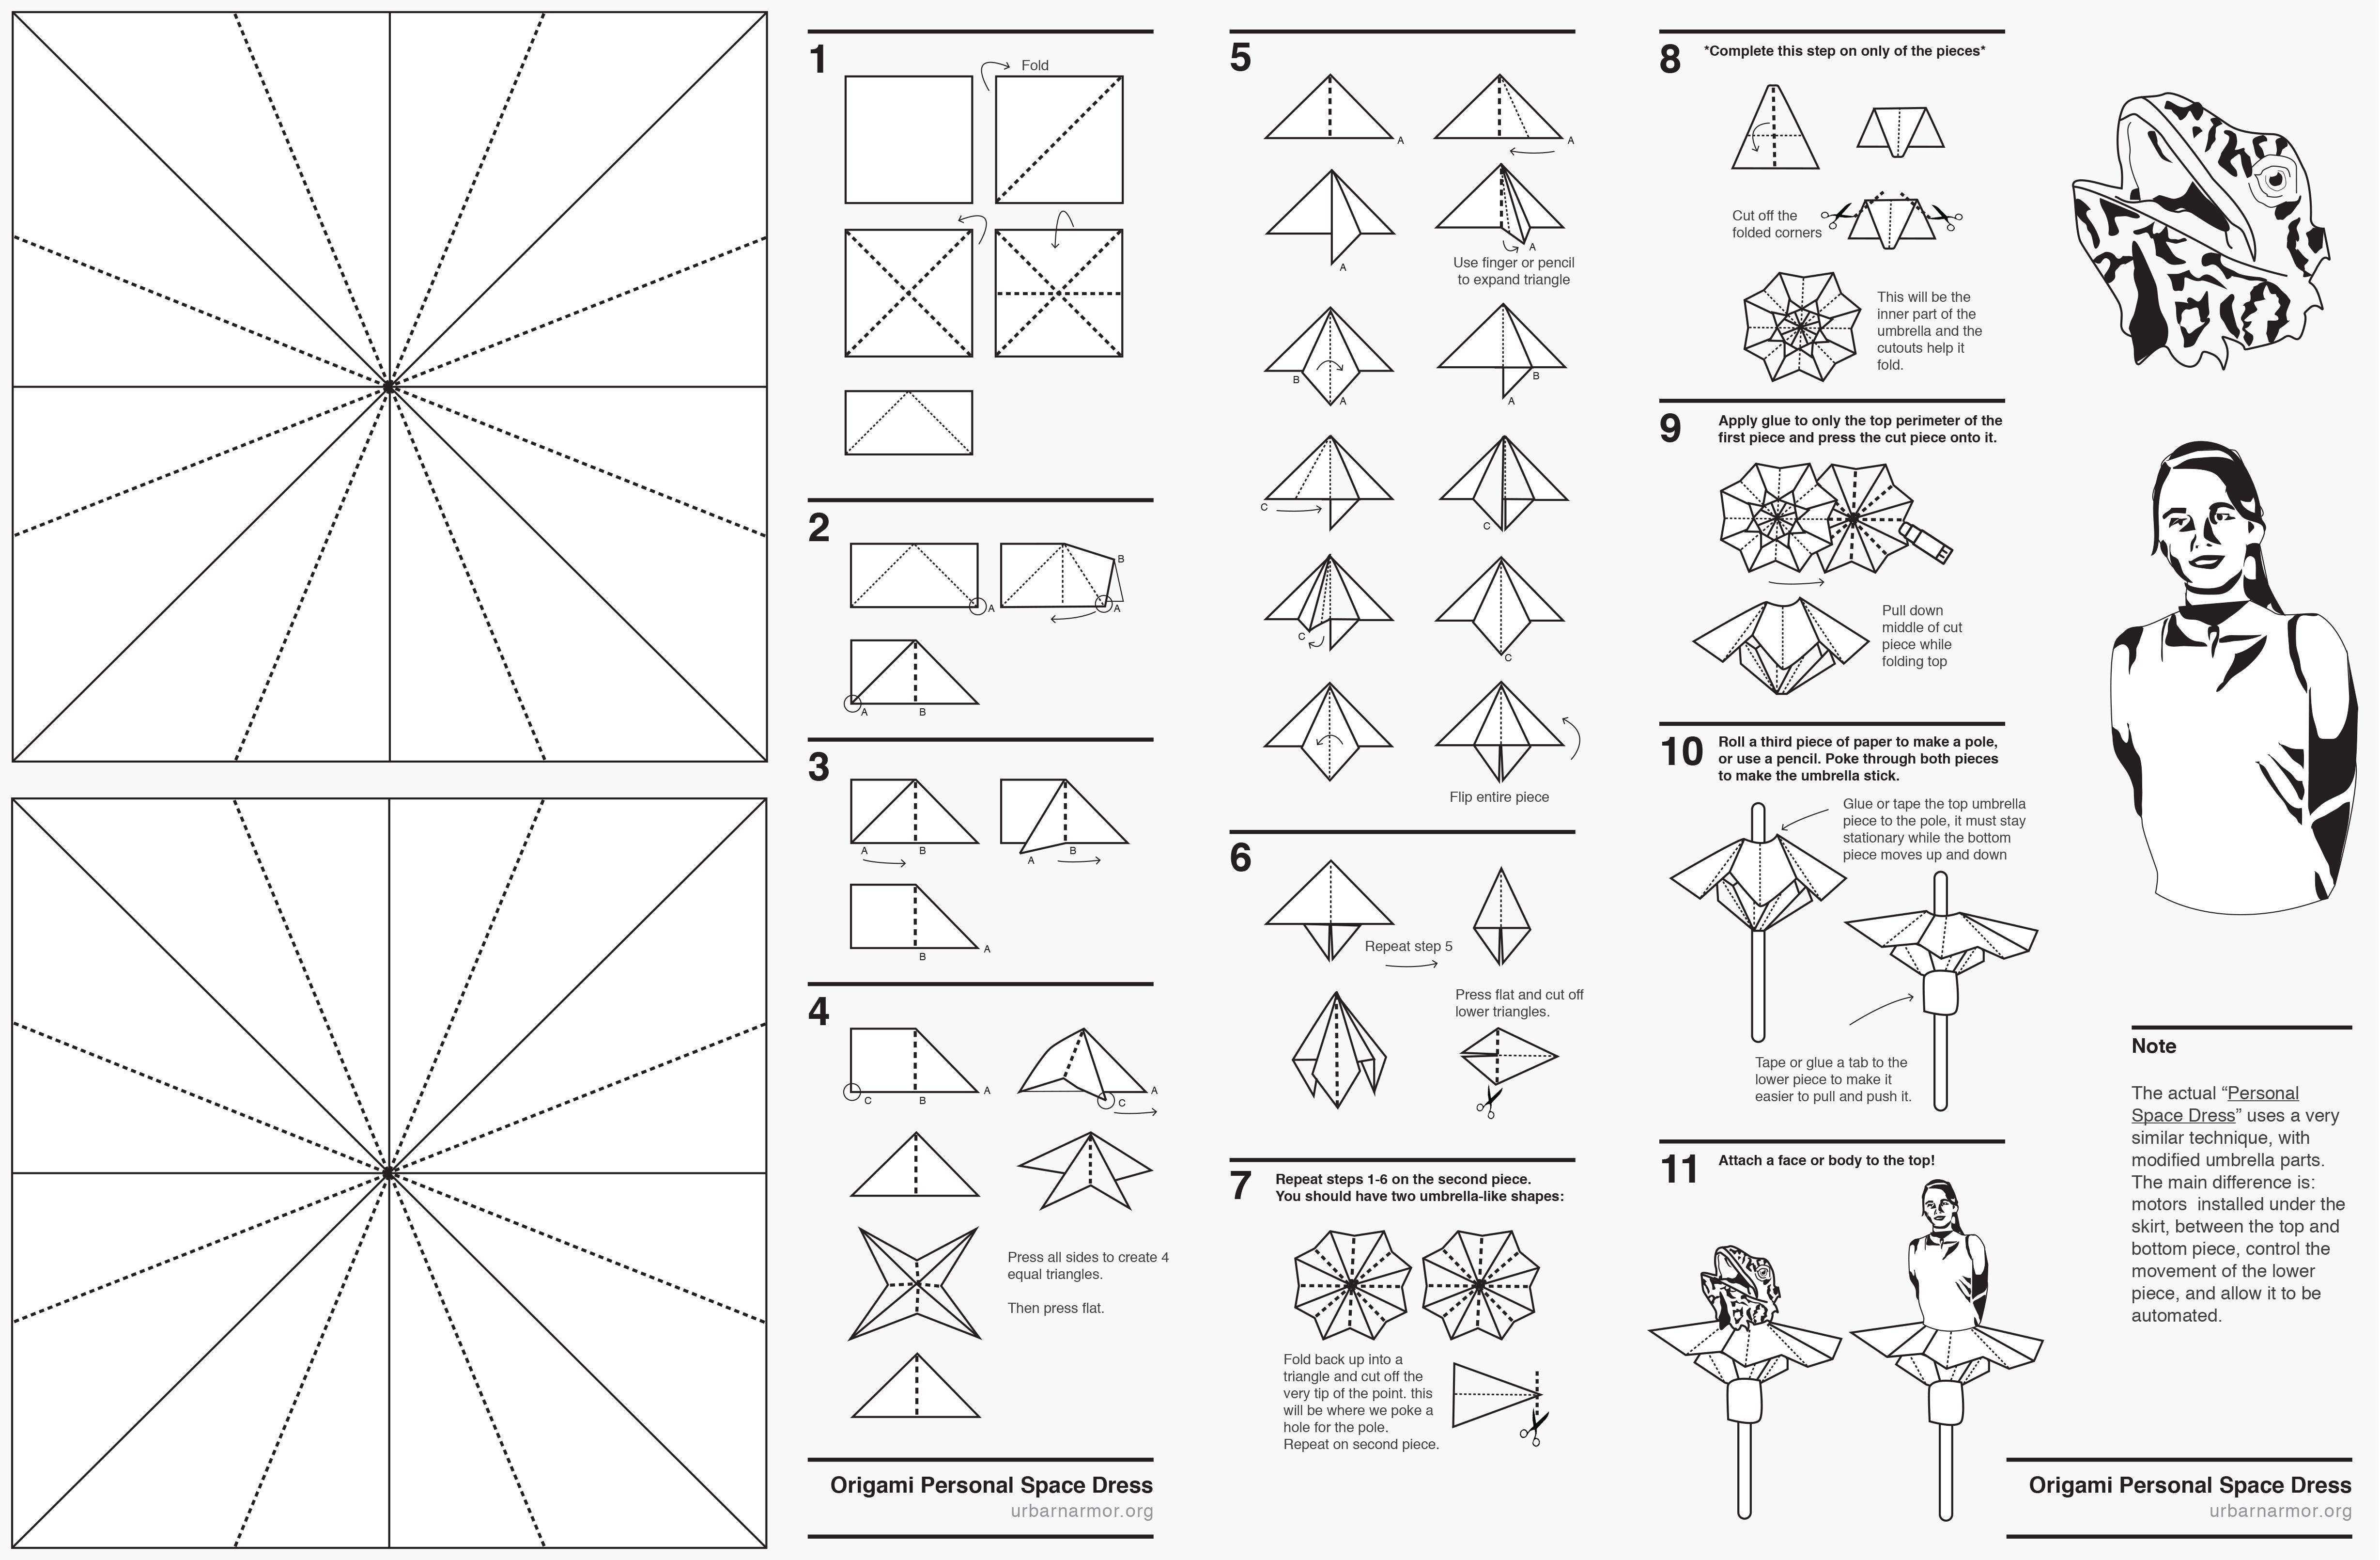 OrigamiDressFinal